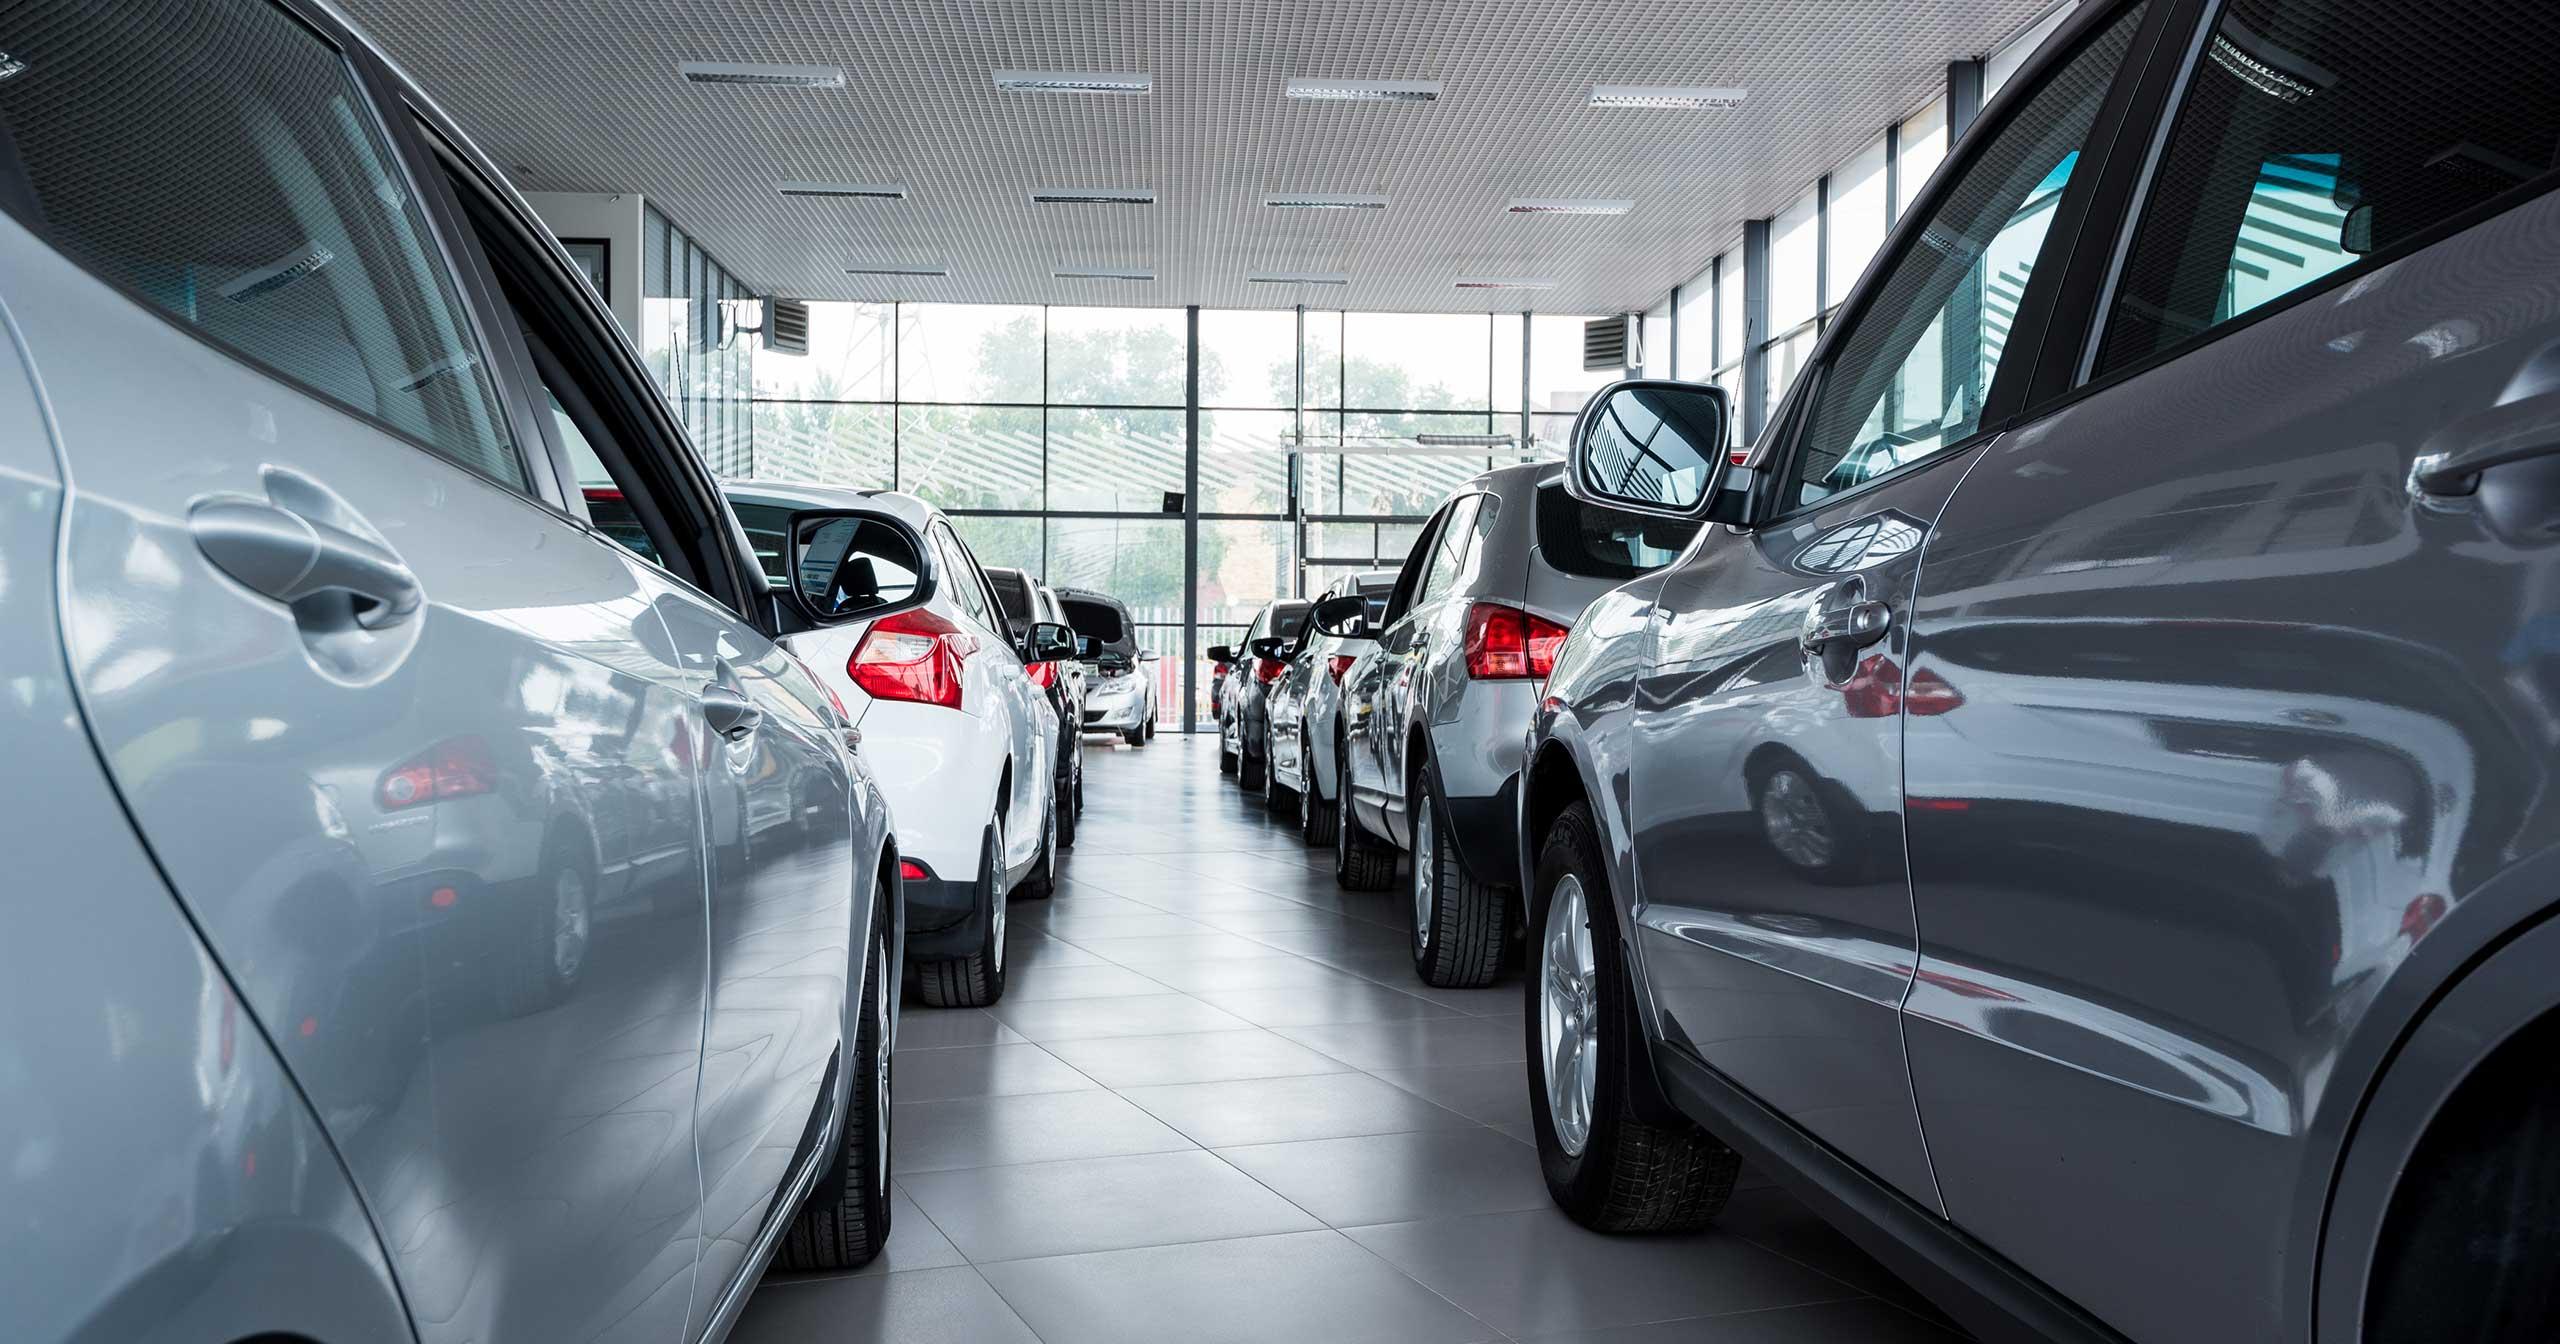 2018 Consumer Survey of Automotive Finance Perceptions Australia